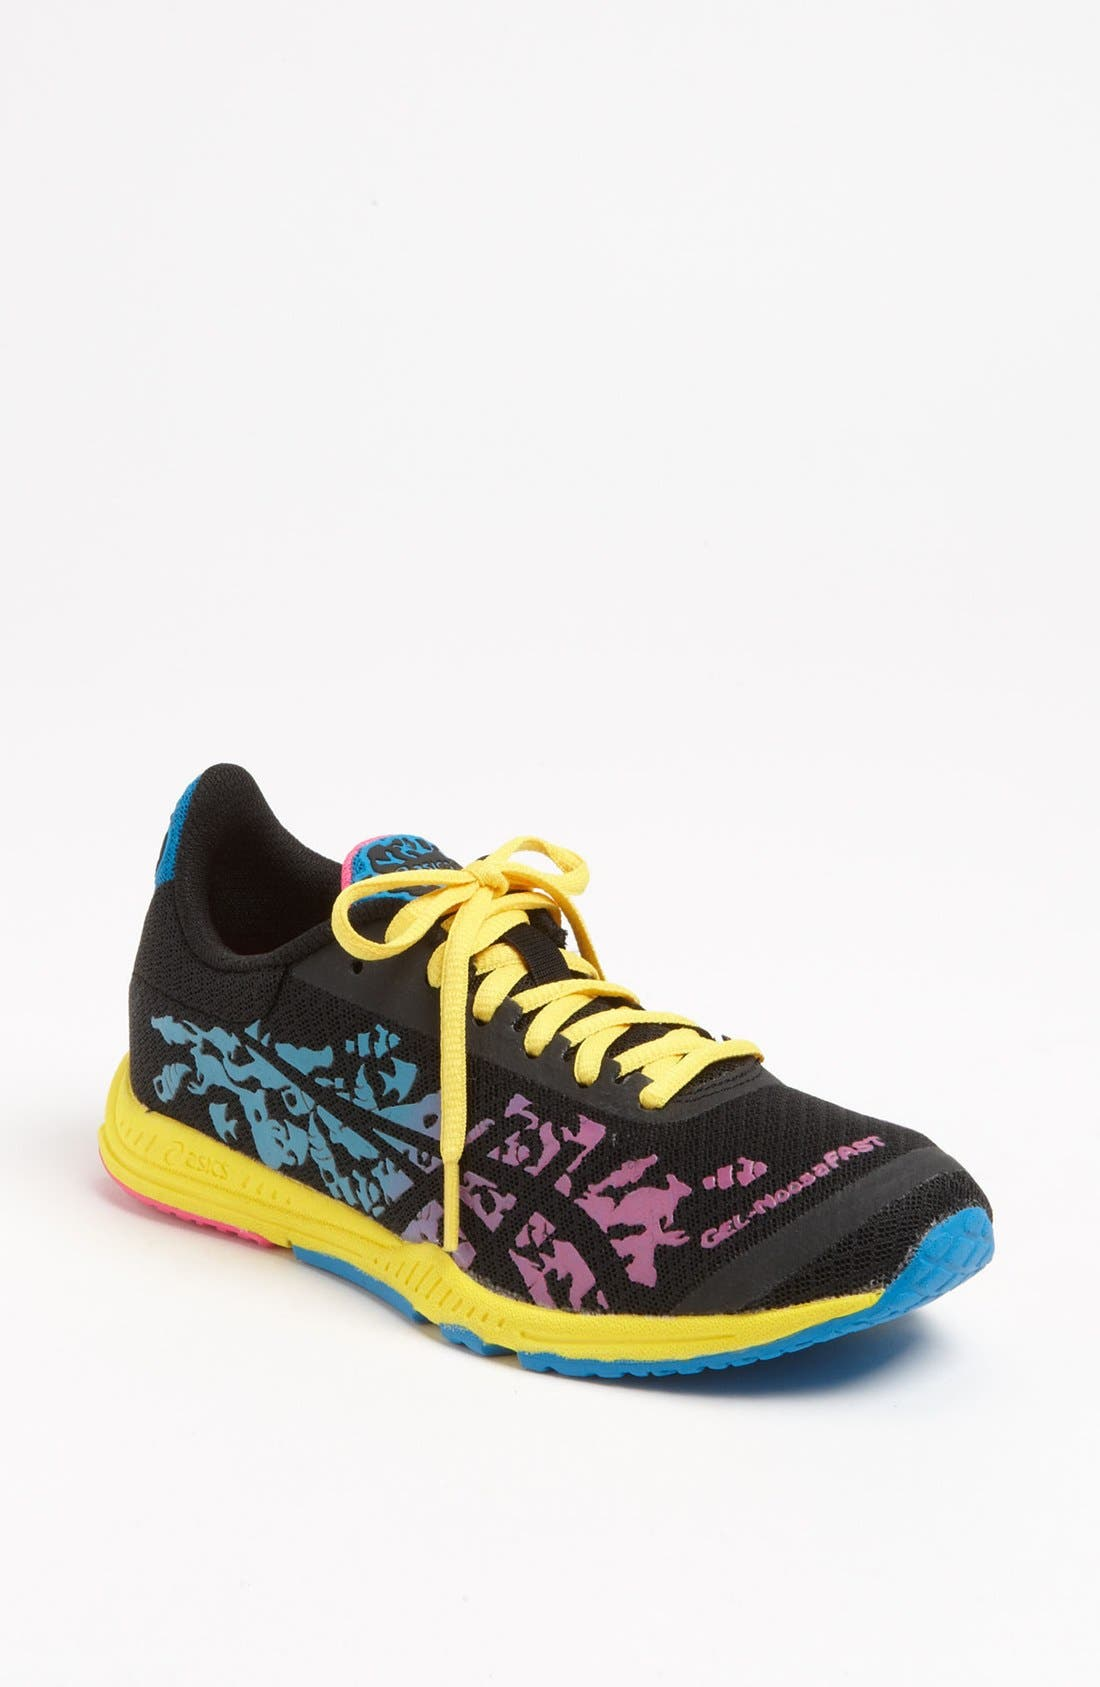 Alternate Image 1 Selected - ASICS® 'GEL-NoosaFAST™' Running Shoe (Women)